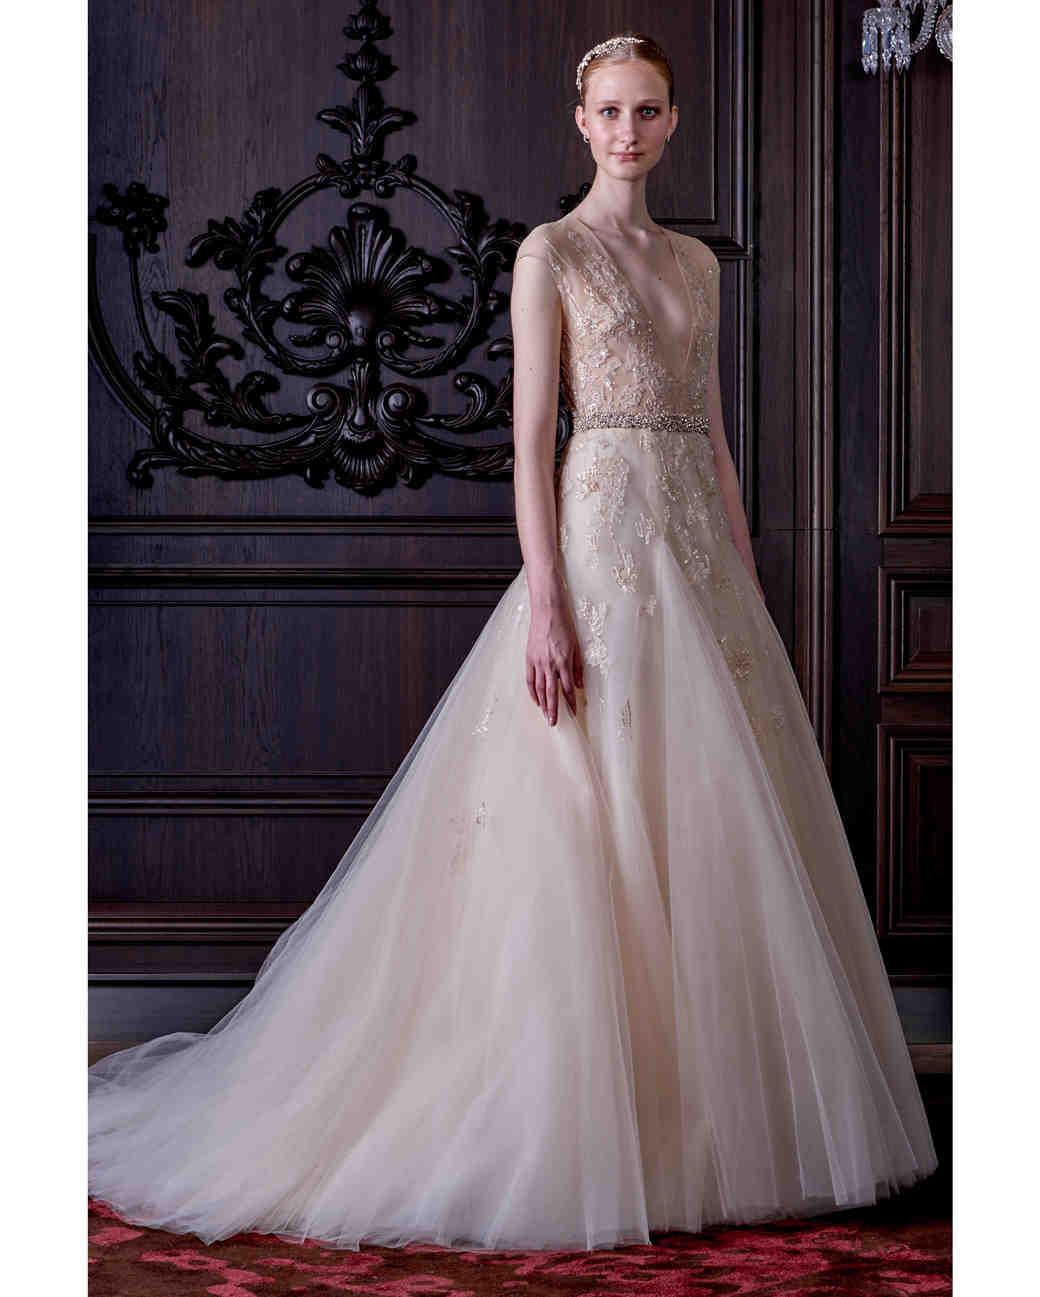 50-states-wedding-dresses-maine-monique-lhuillier-0615.jpg